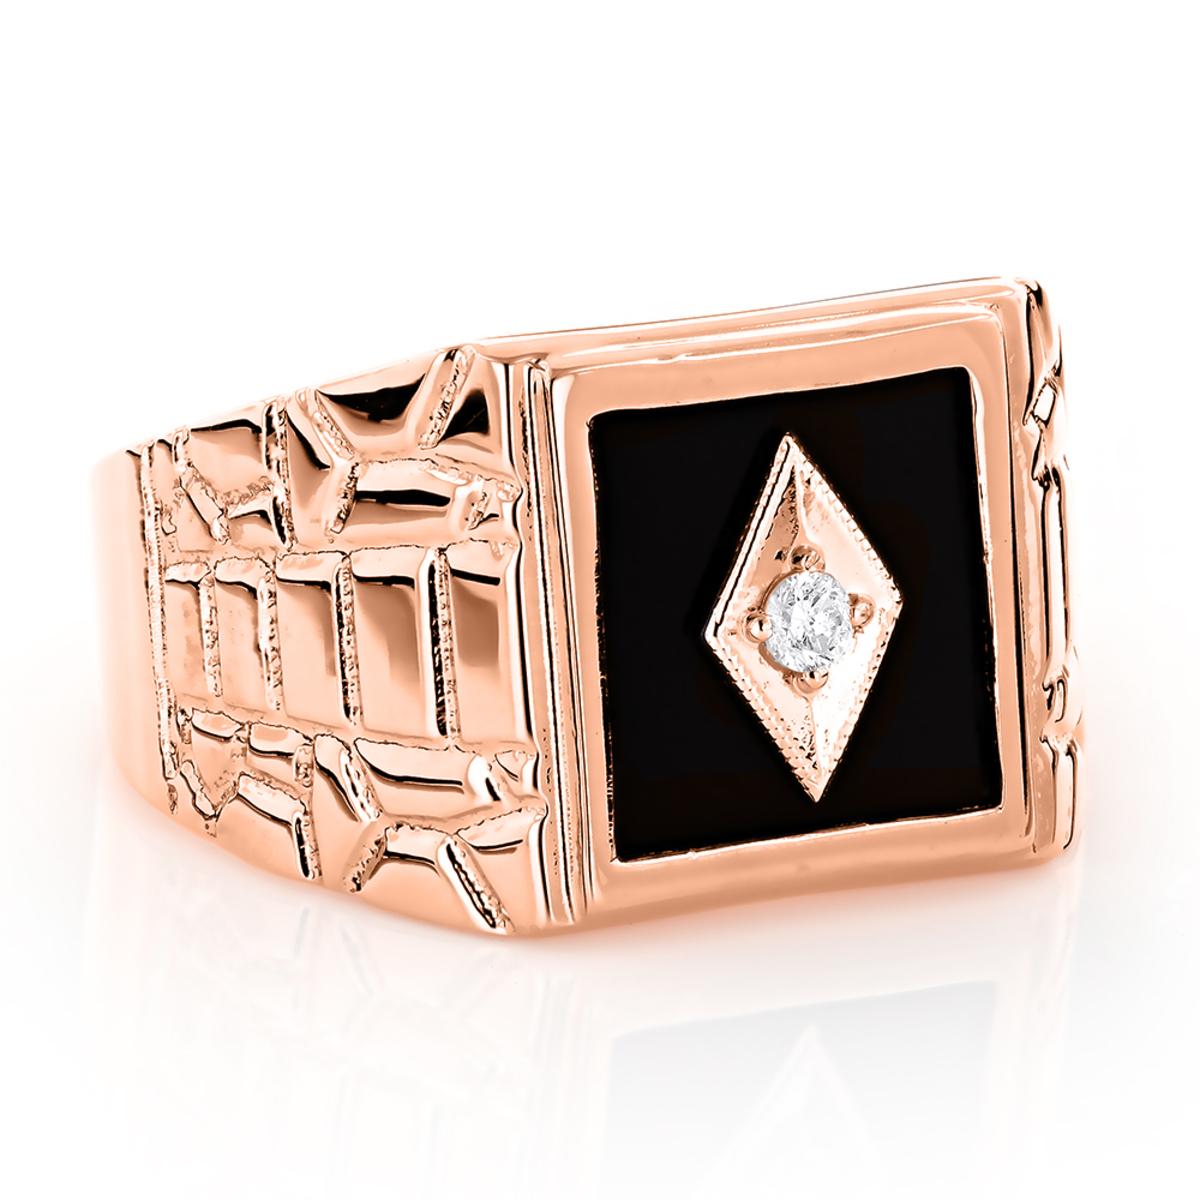 Black Onyx and Diamond Rings 14K Gold Mens Ring 0.10ct